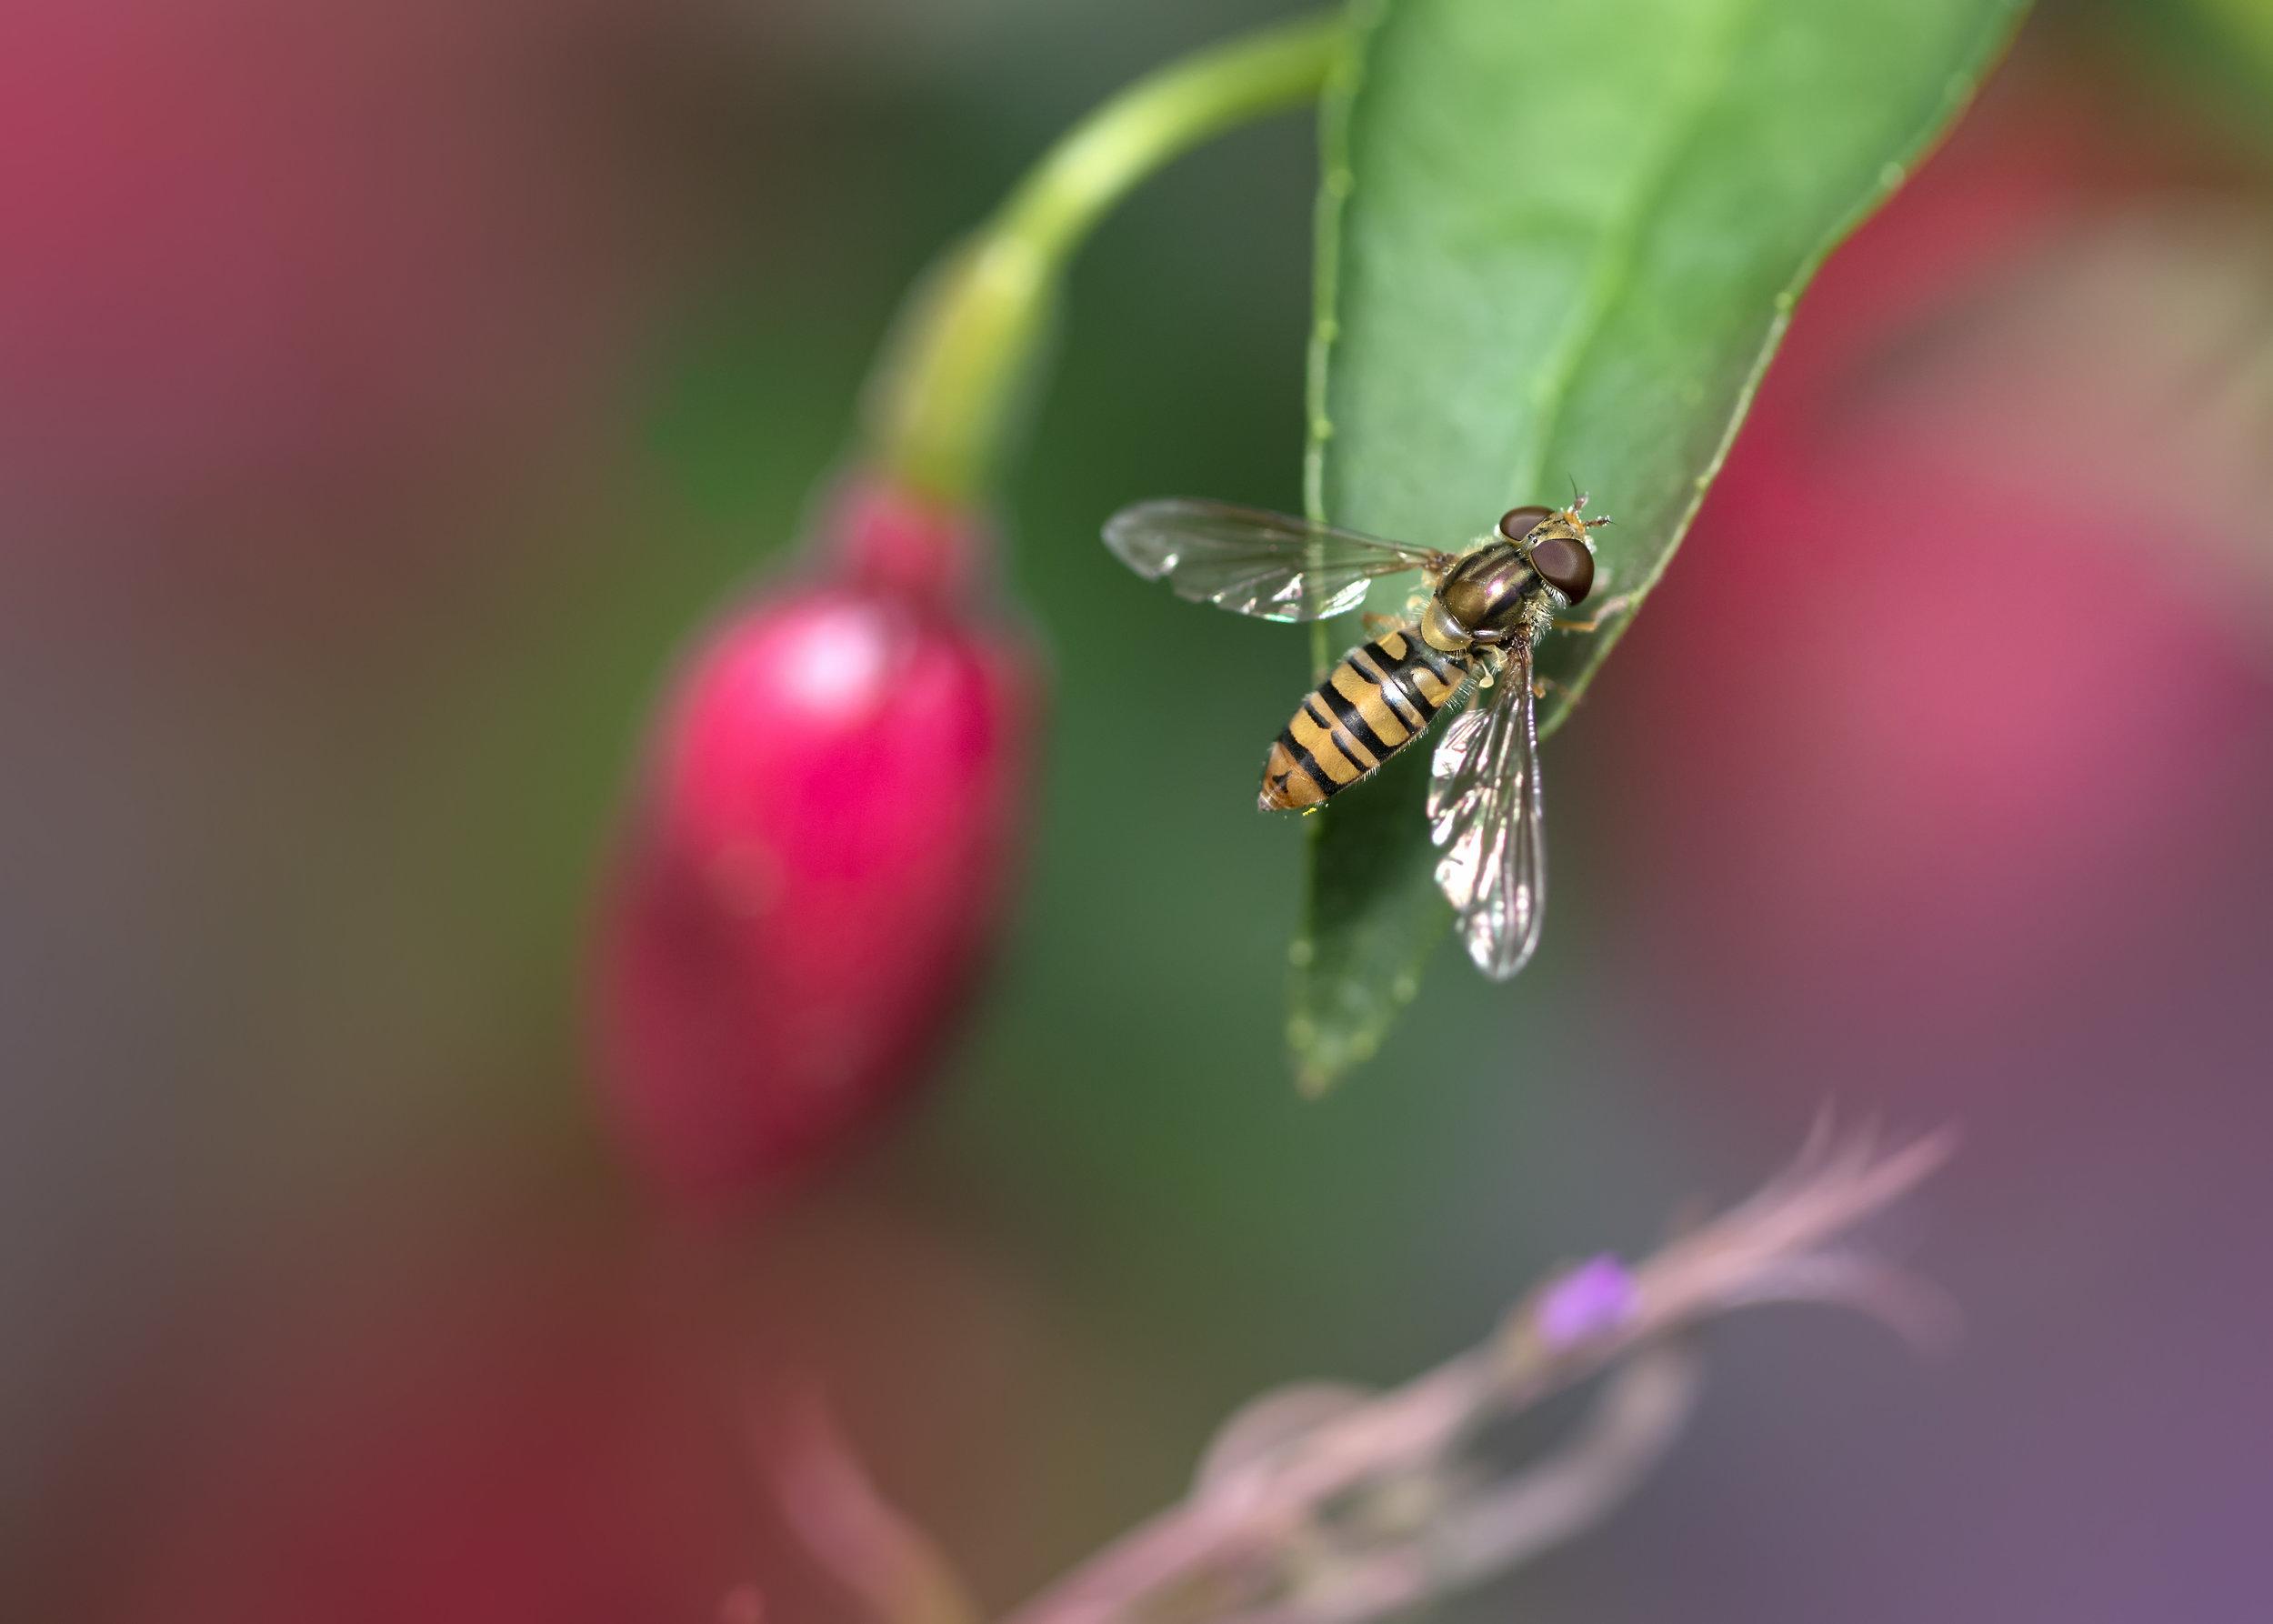 Marmalade Hoverfly C 21st July .jpg